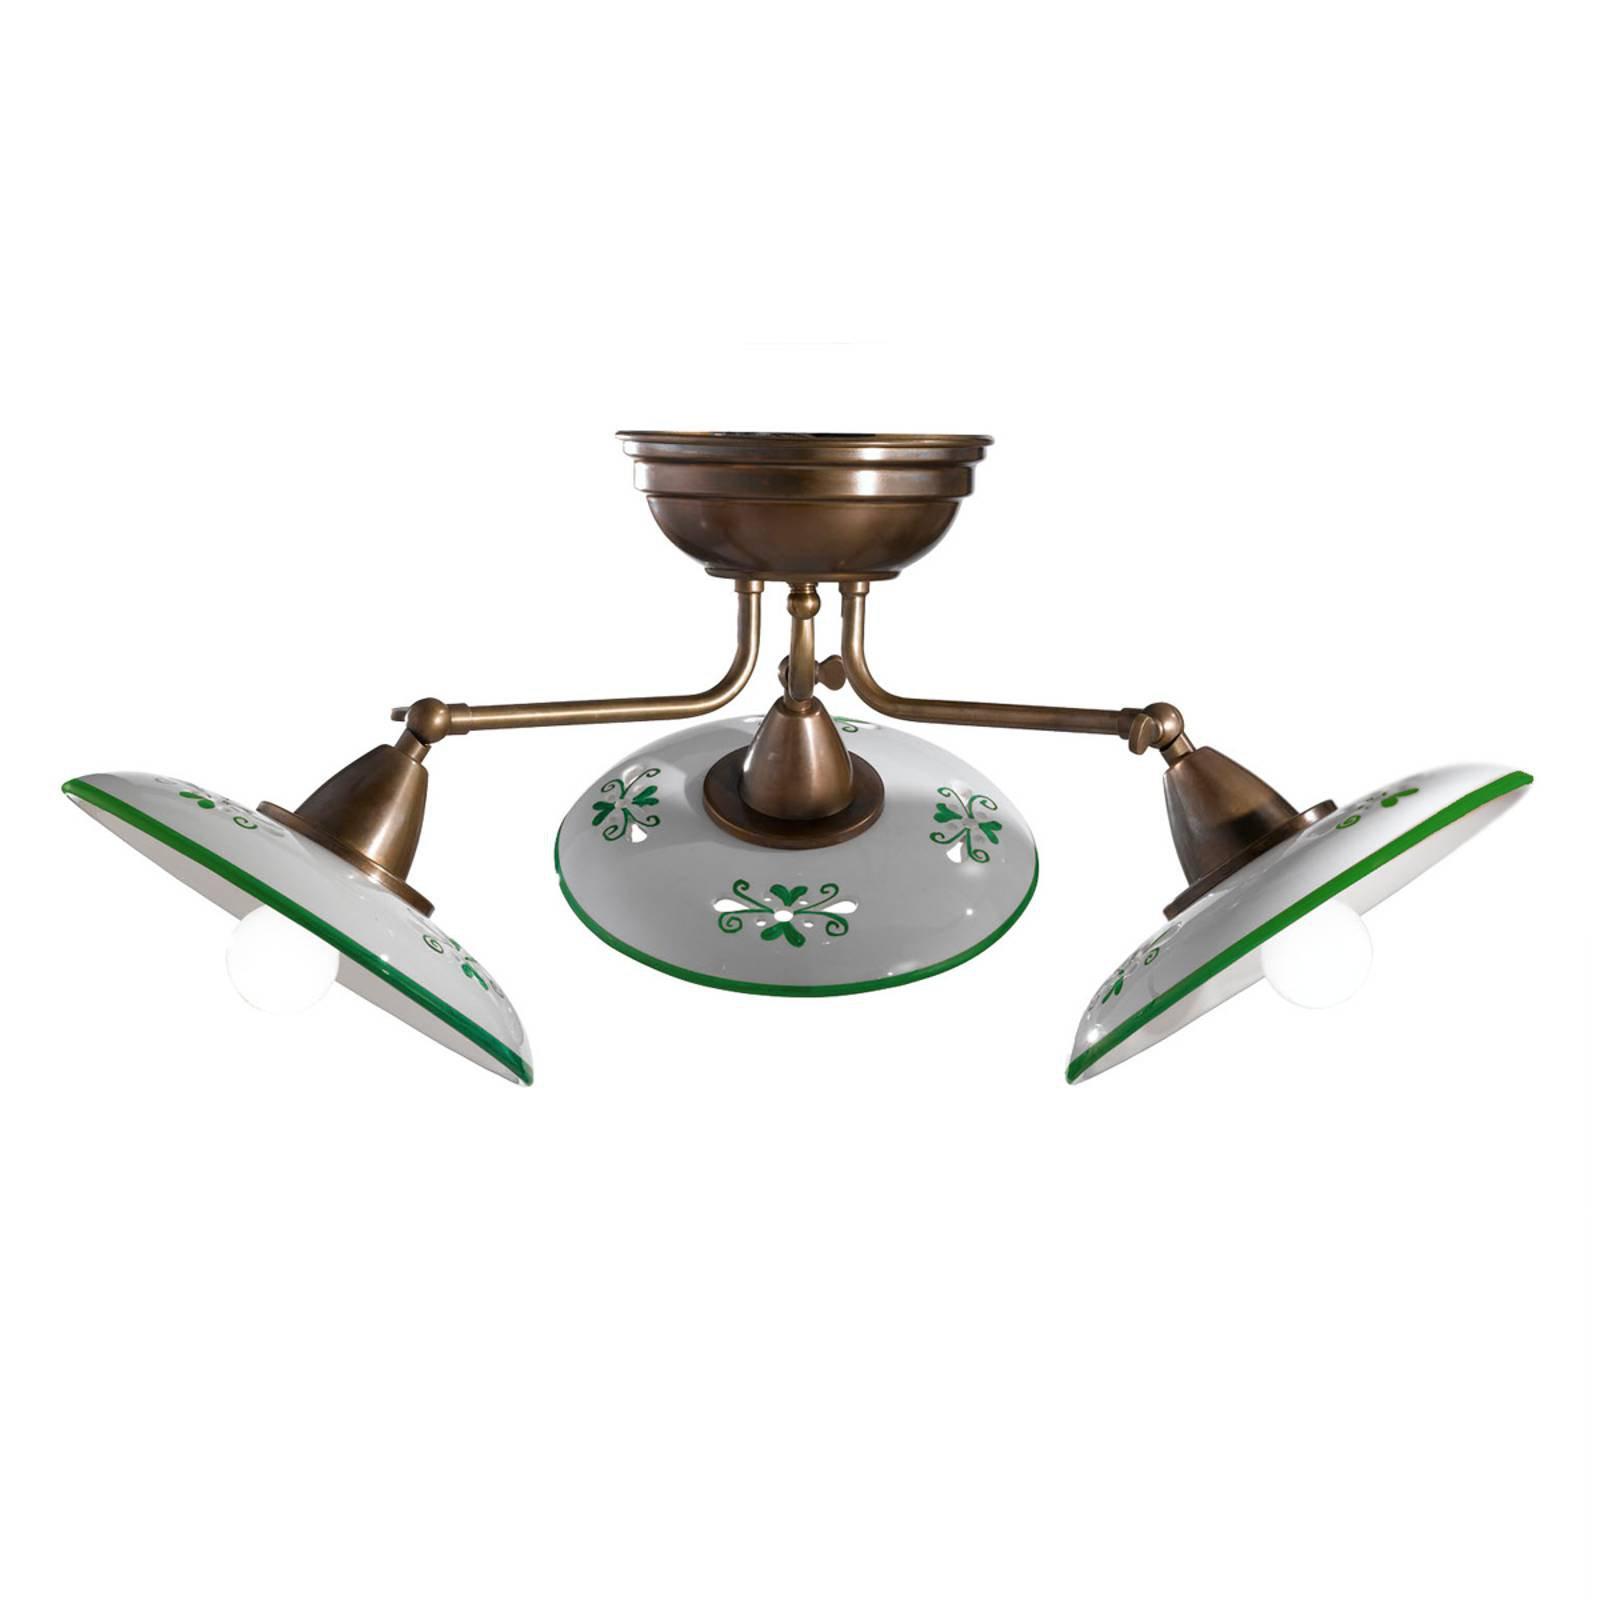 Bassano - 3 lyskilder keramisk taklampe, grønn